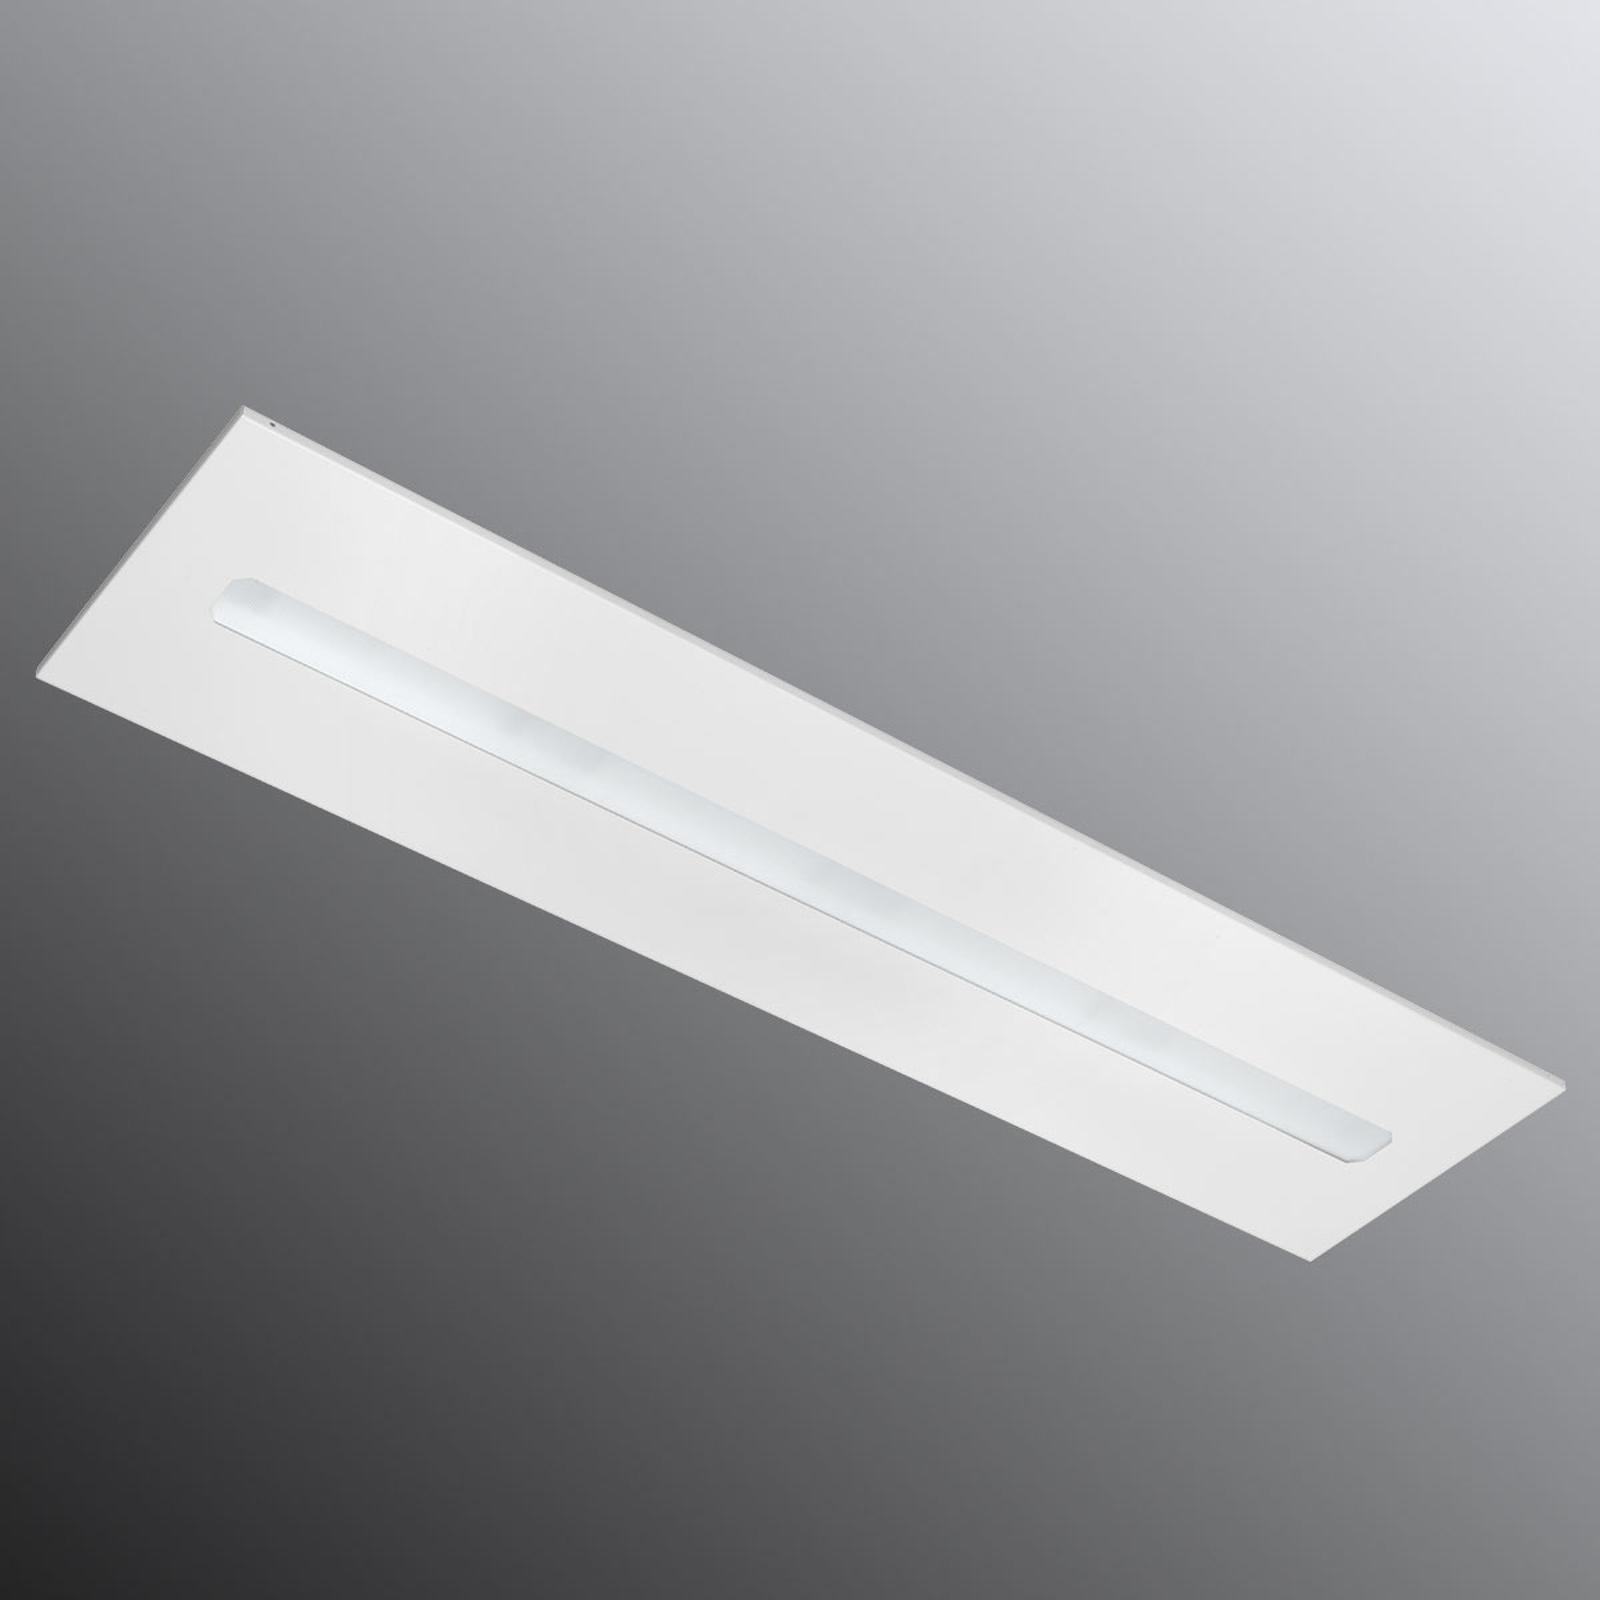 Freyn II Recessed pannello LED 124,5 x 31cm 3.000K